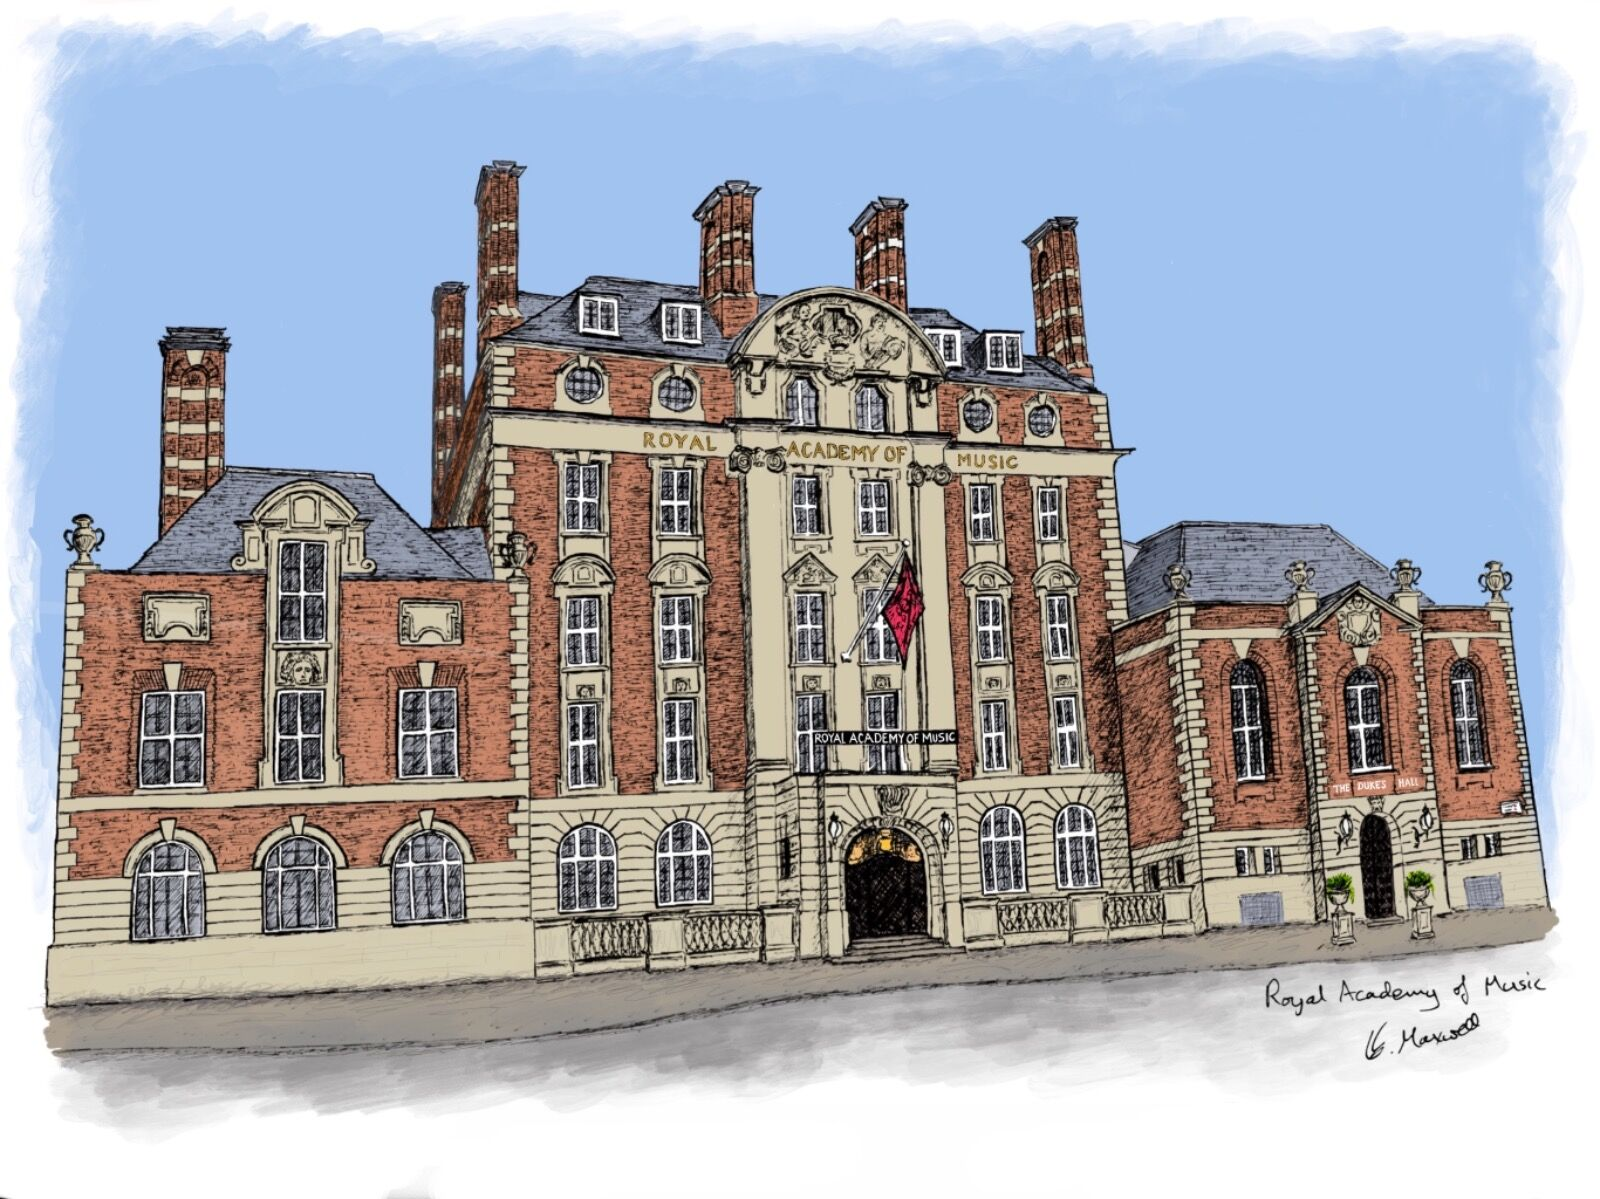 Royal Academy of Music (colour)